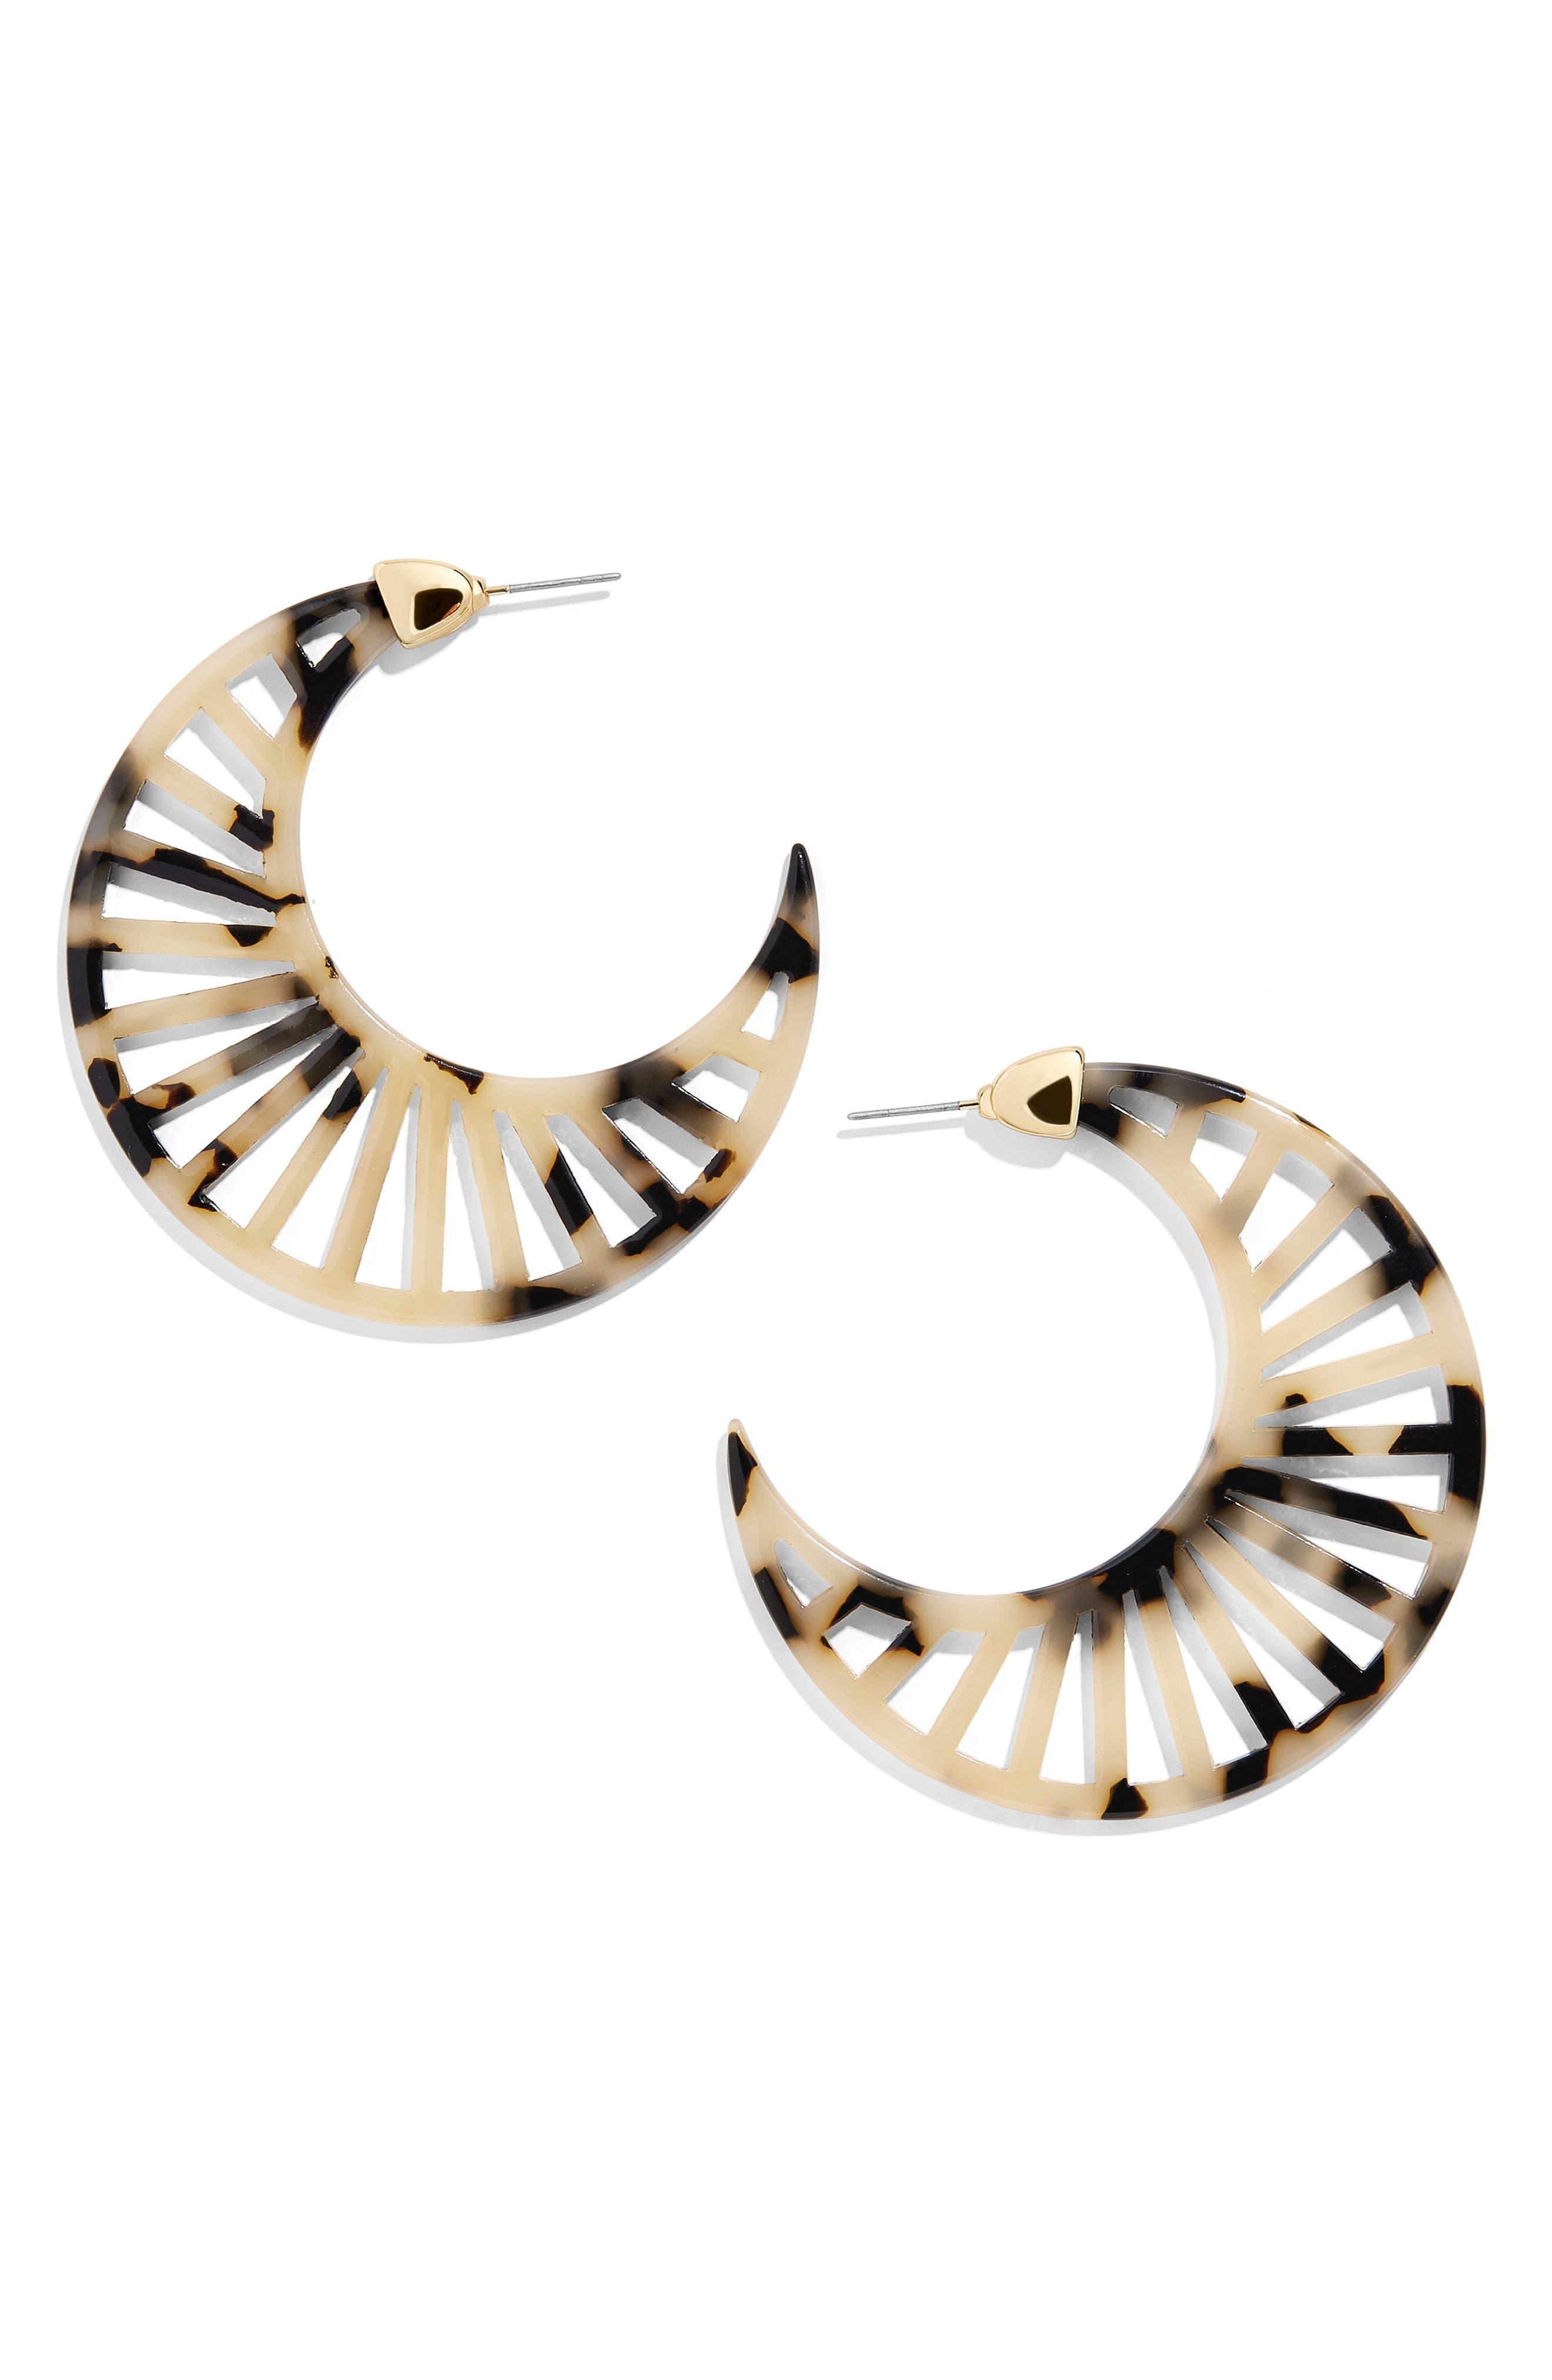 BAUBLEBAR, Resin Crescent Moon Earrings, Main thumbnail 1, color, TORTOISE